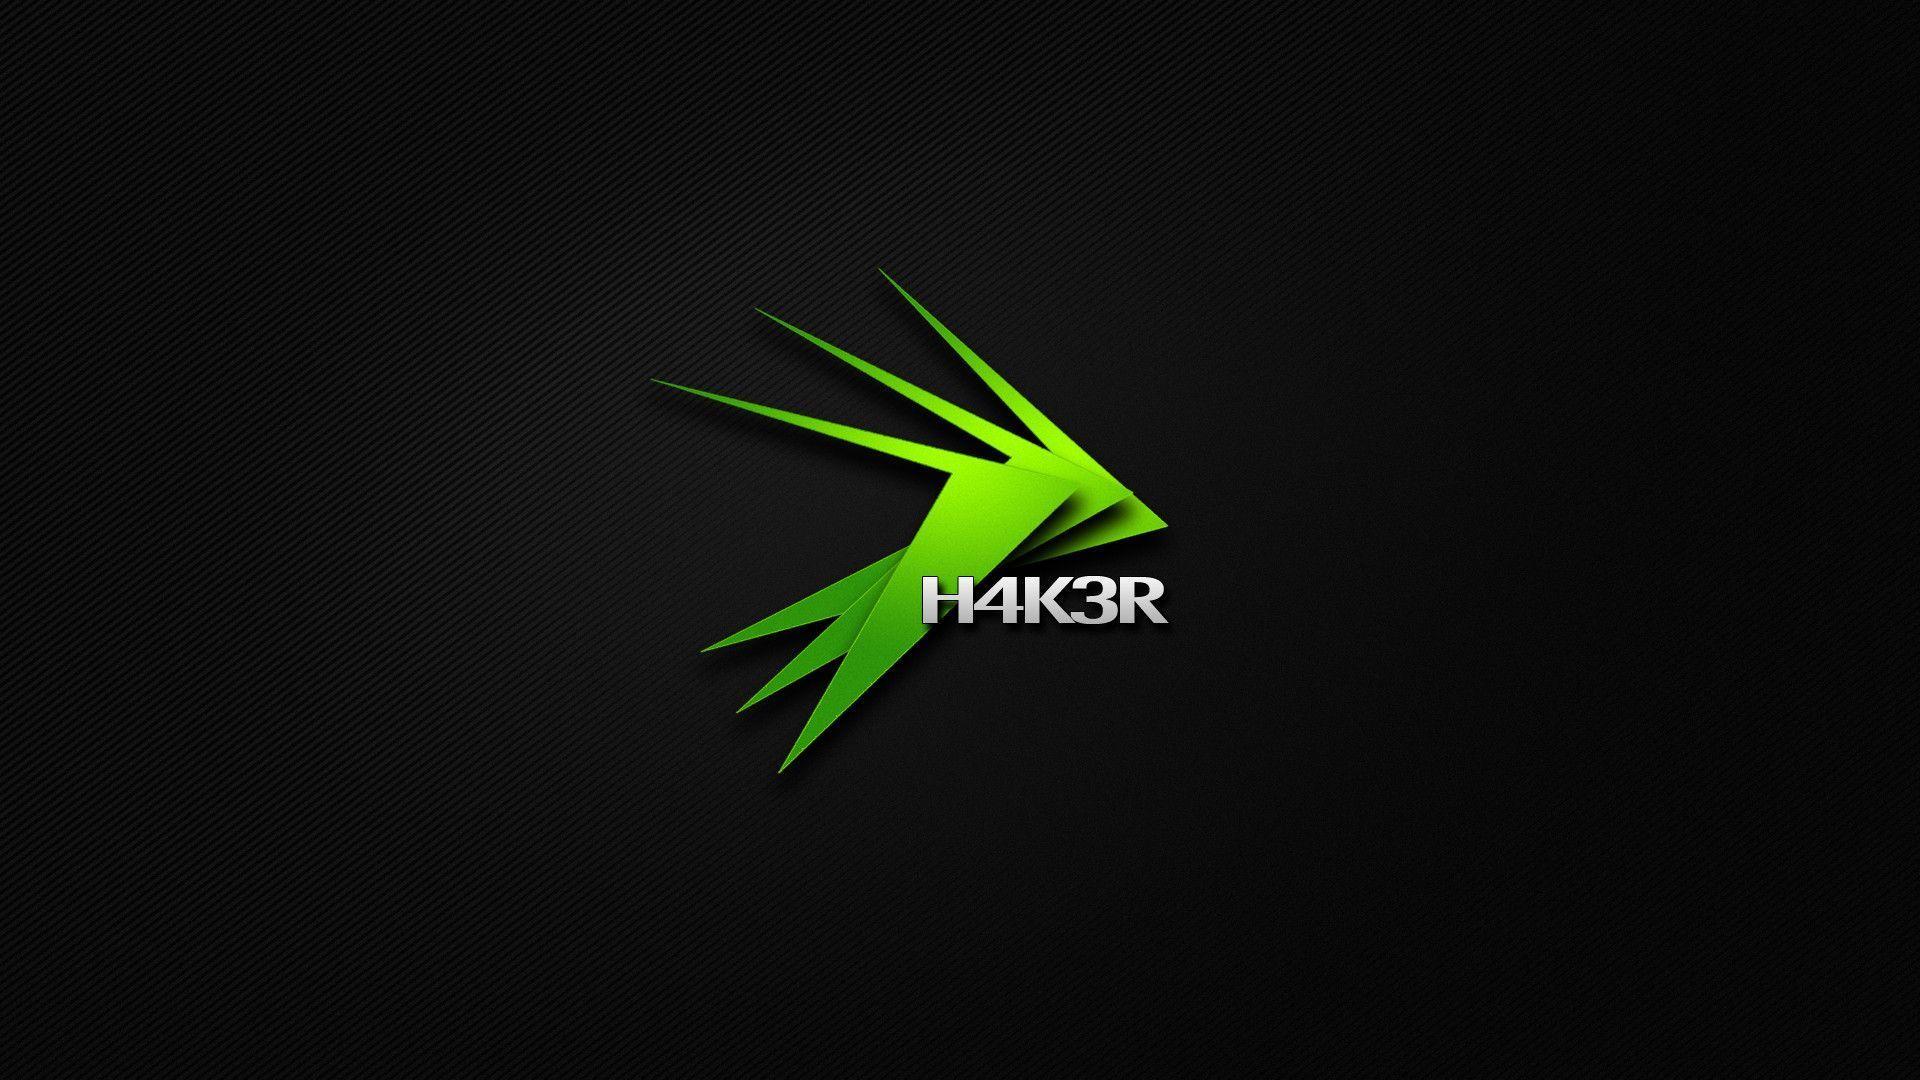 Hacker-wallpaper-wp3406495